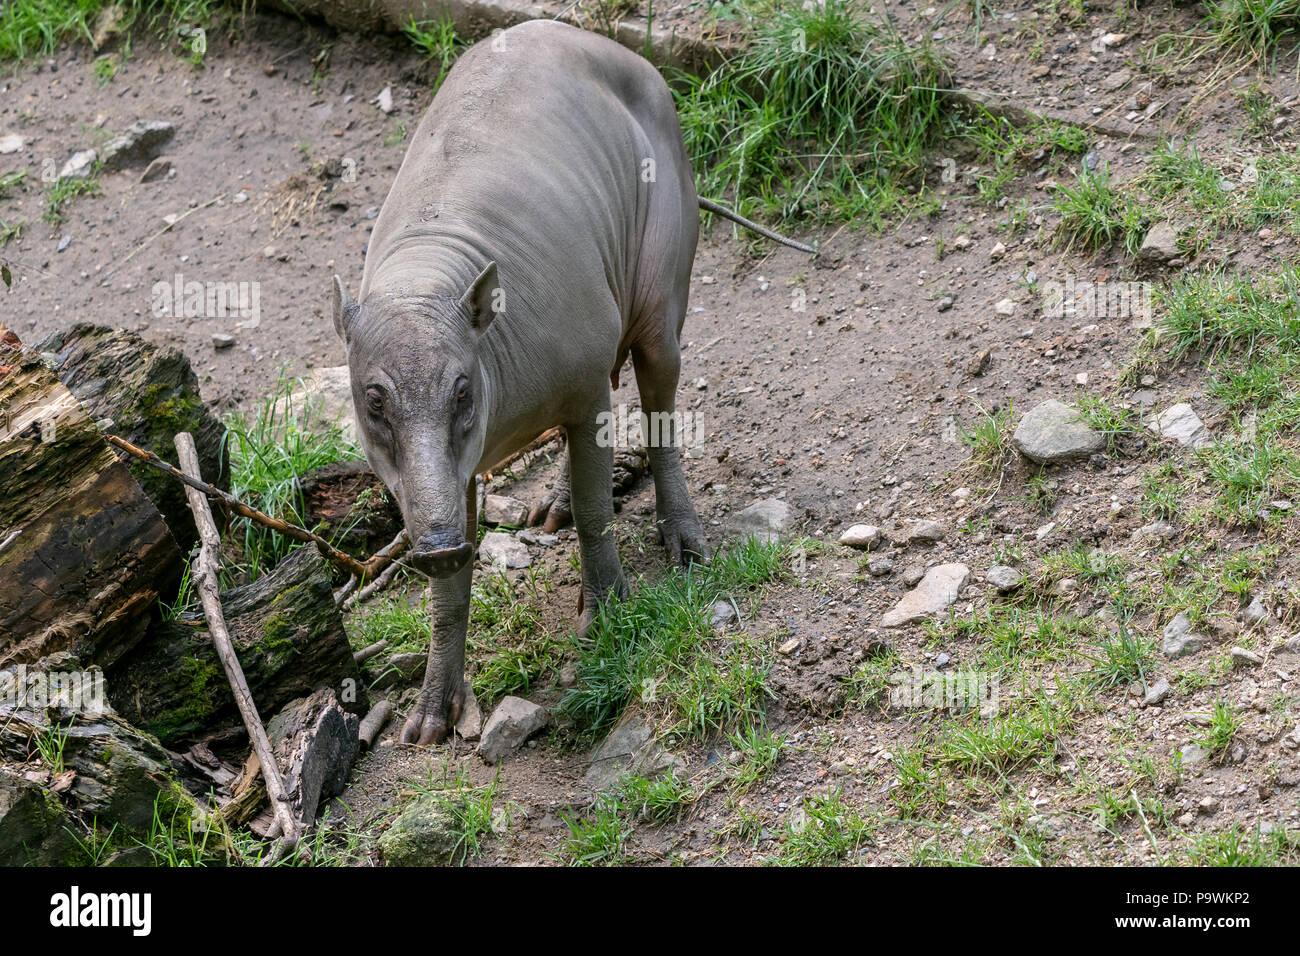 Babirusa Celebes (Babyrousa babyrussa) endangered animal species. Female Buru bairusa - Stock Image